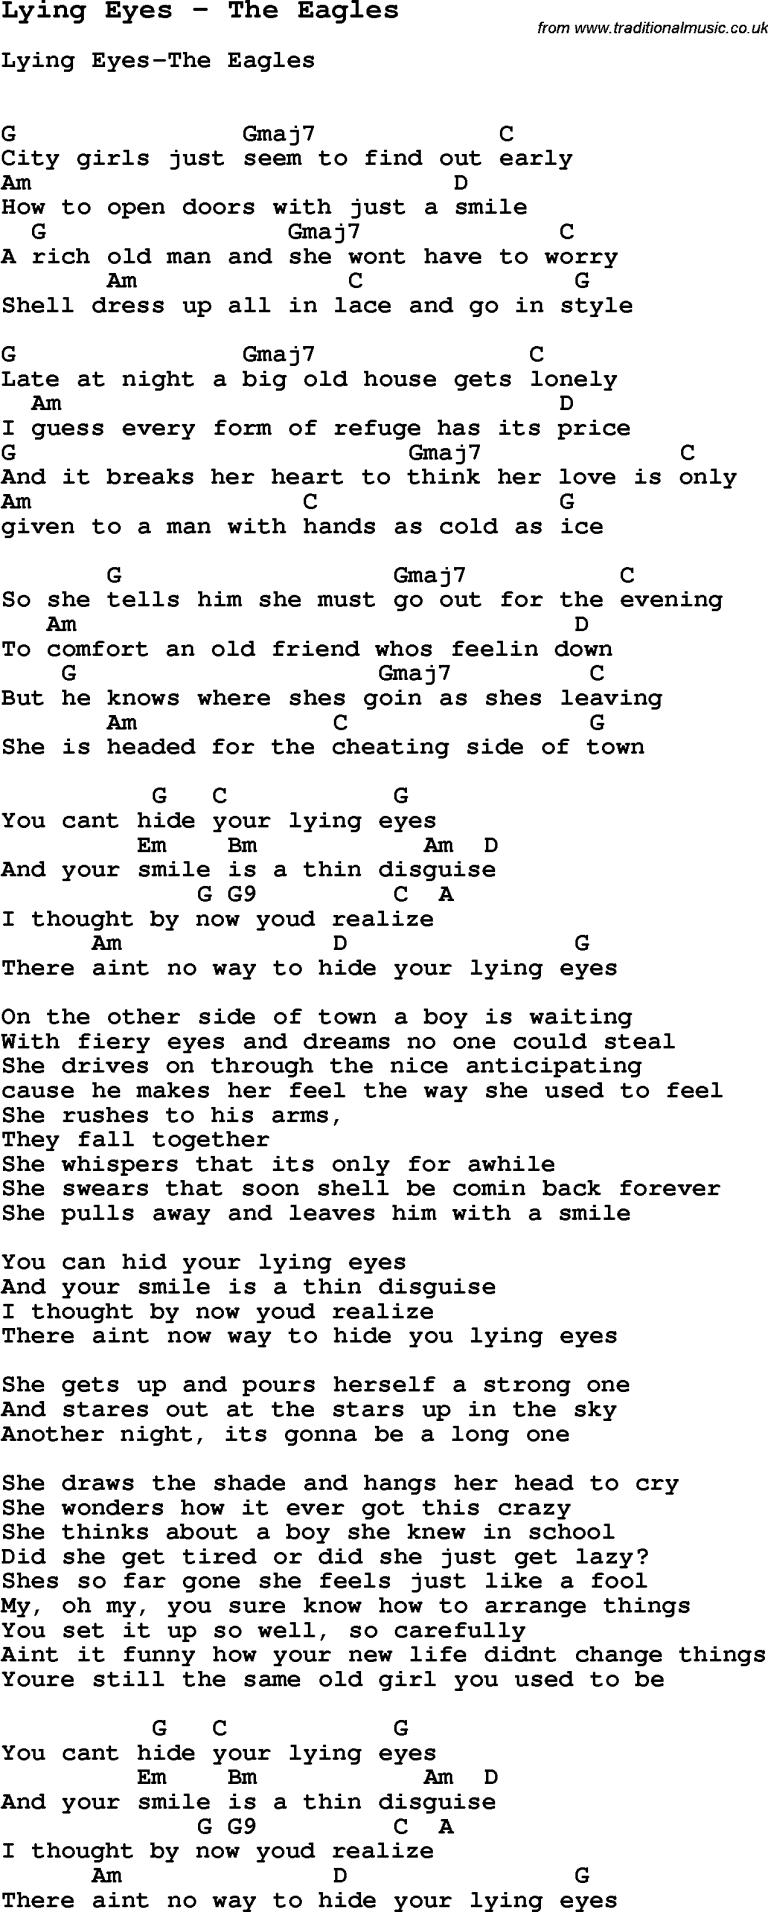 "Glenn Frey's Greatest Eagles Song ""Lyin' Eyes"" The True Story ..."